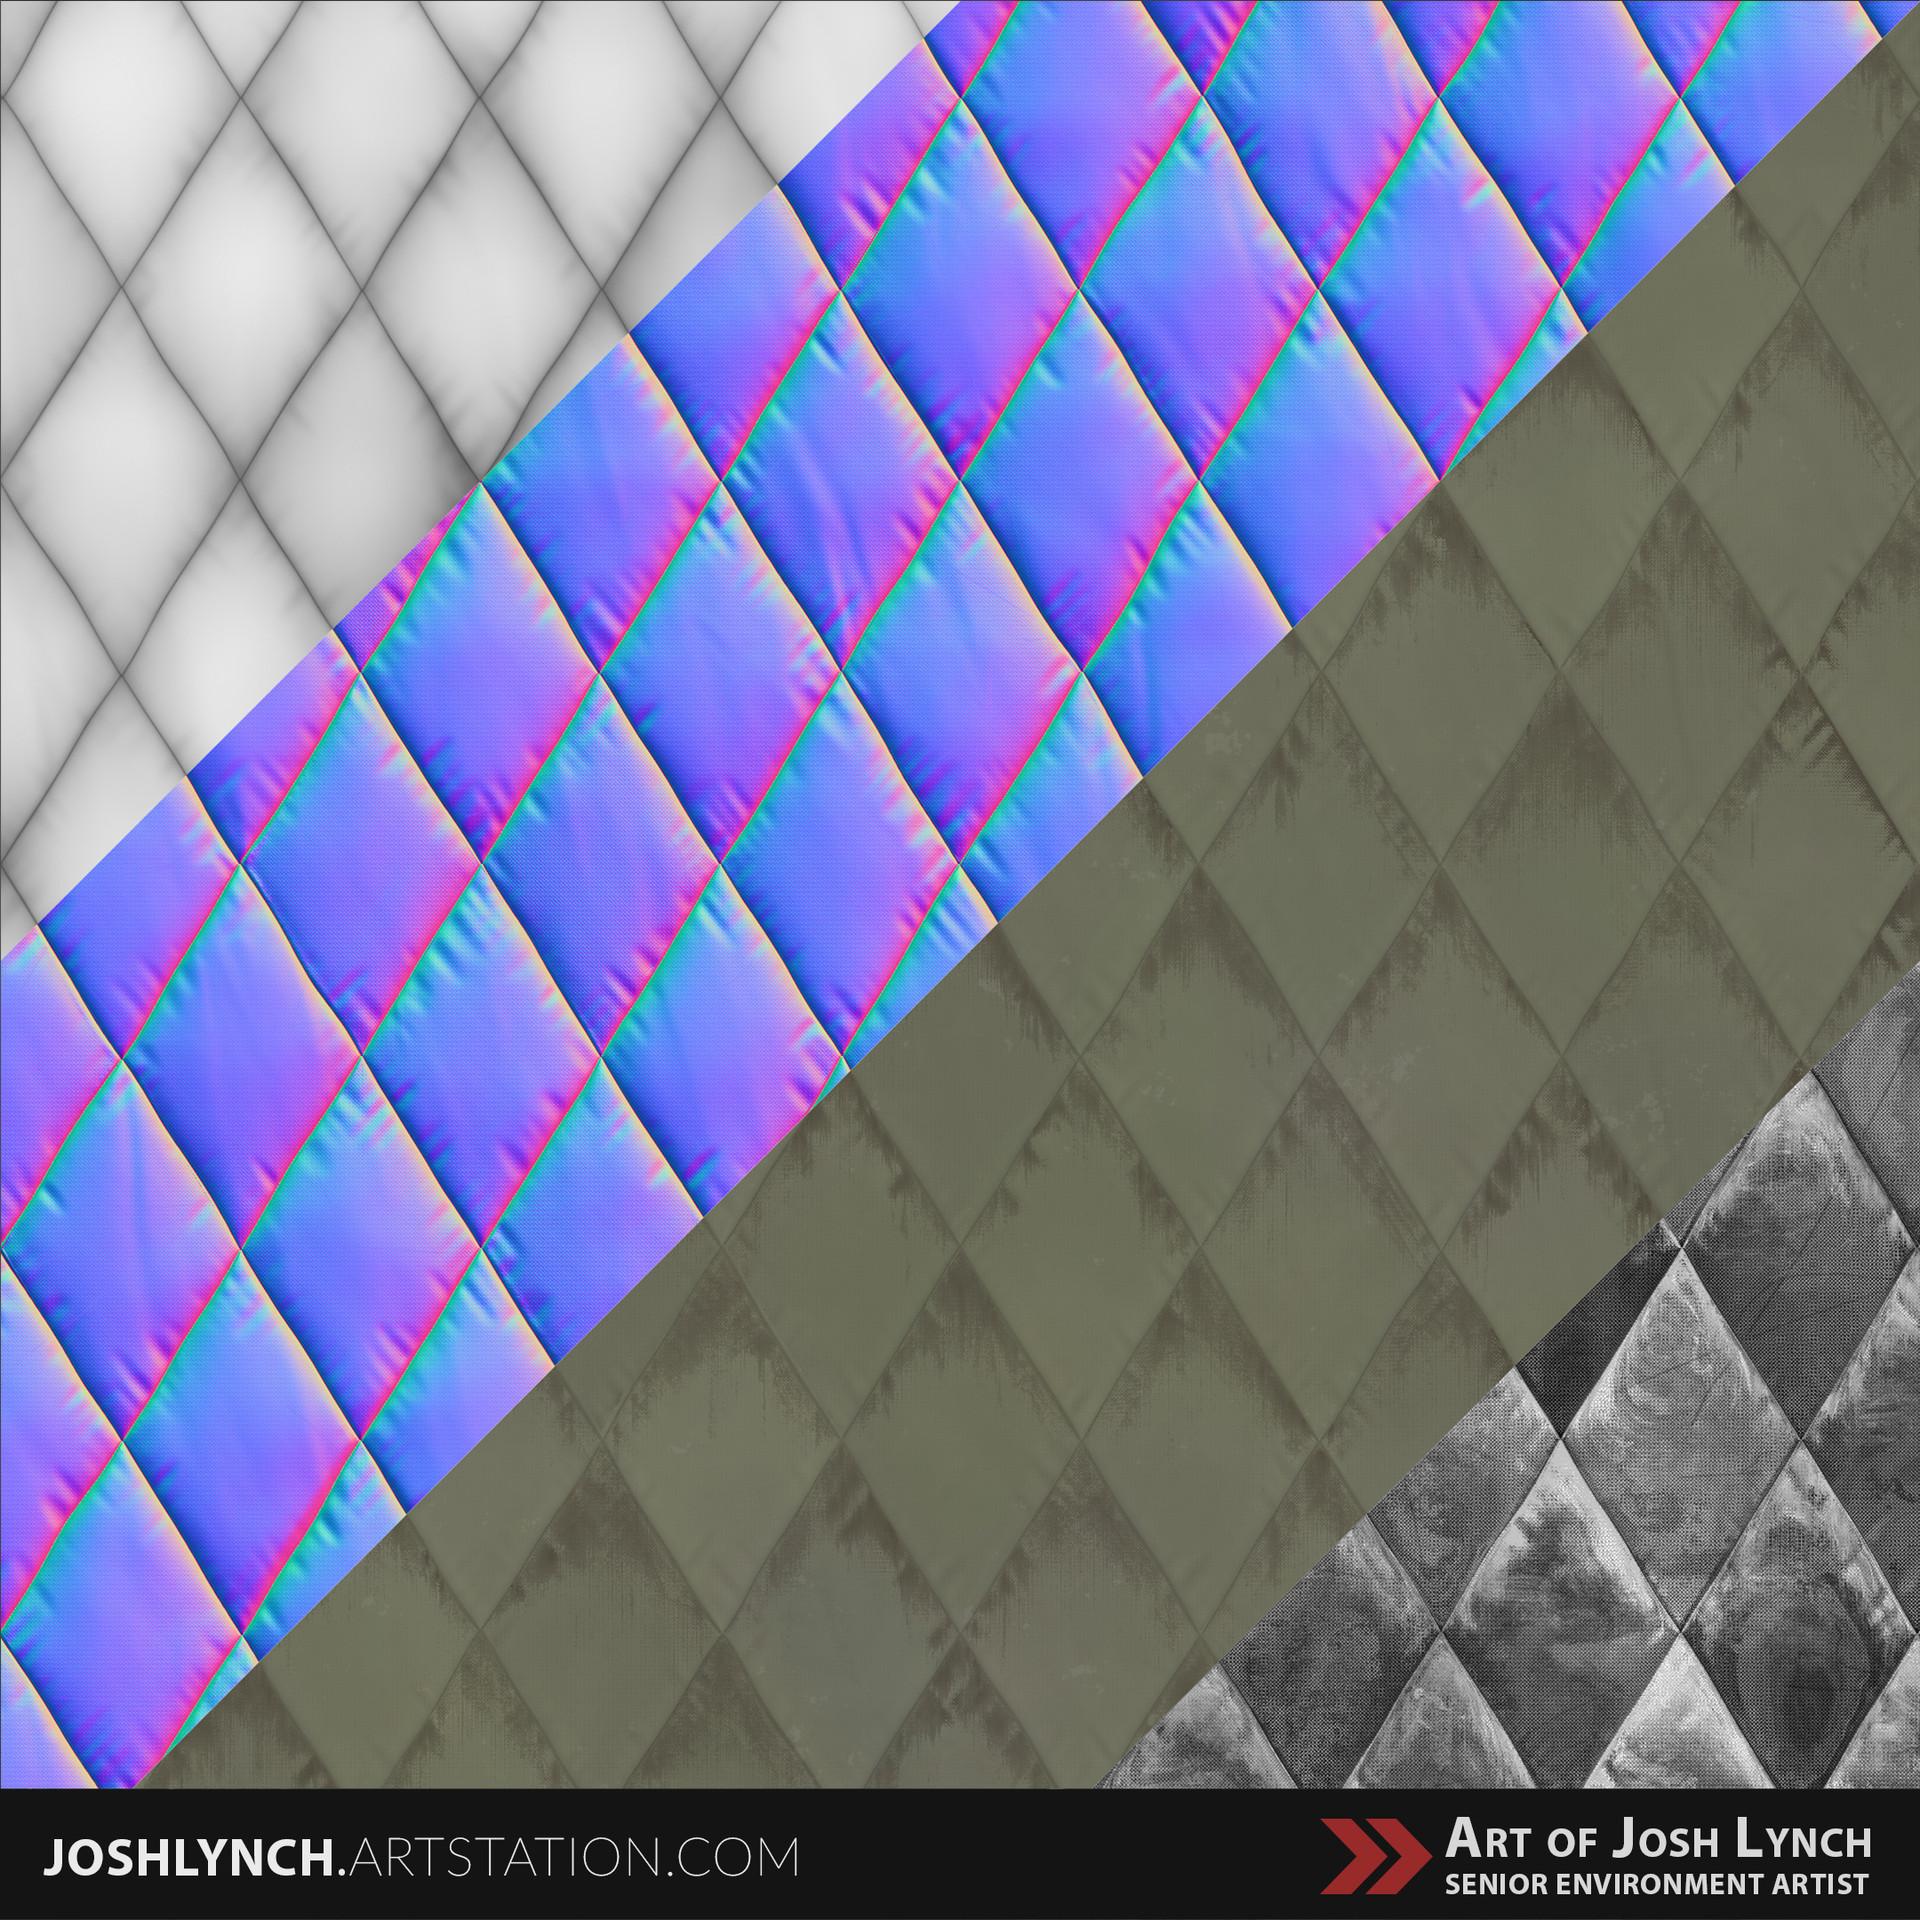 Joshua lynch padded wall 01 layout comp square flats